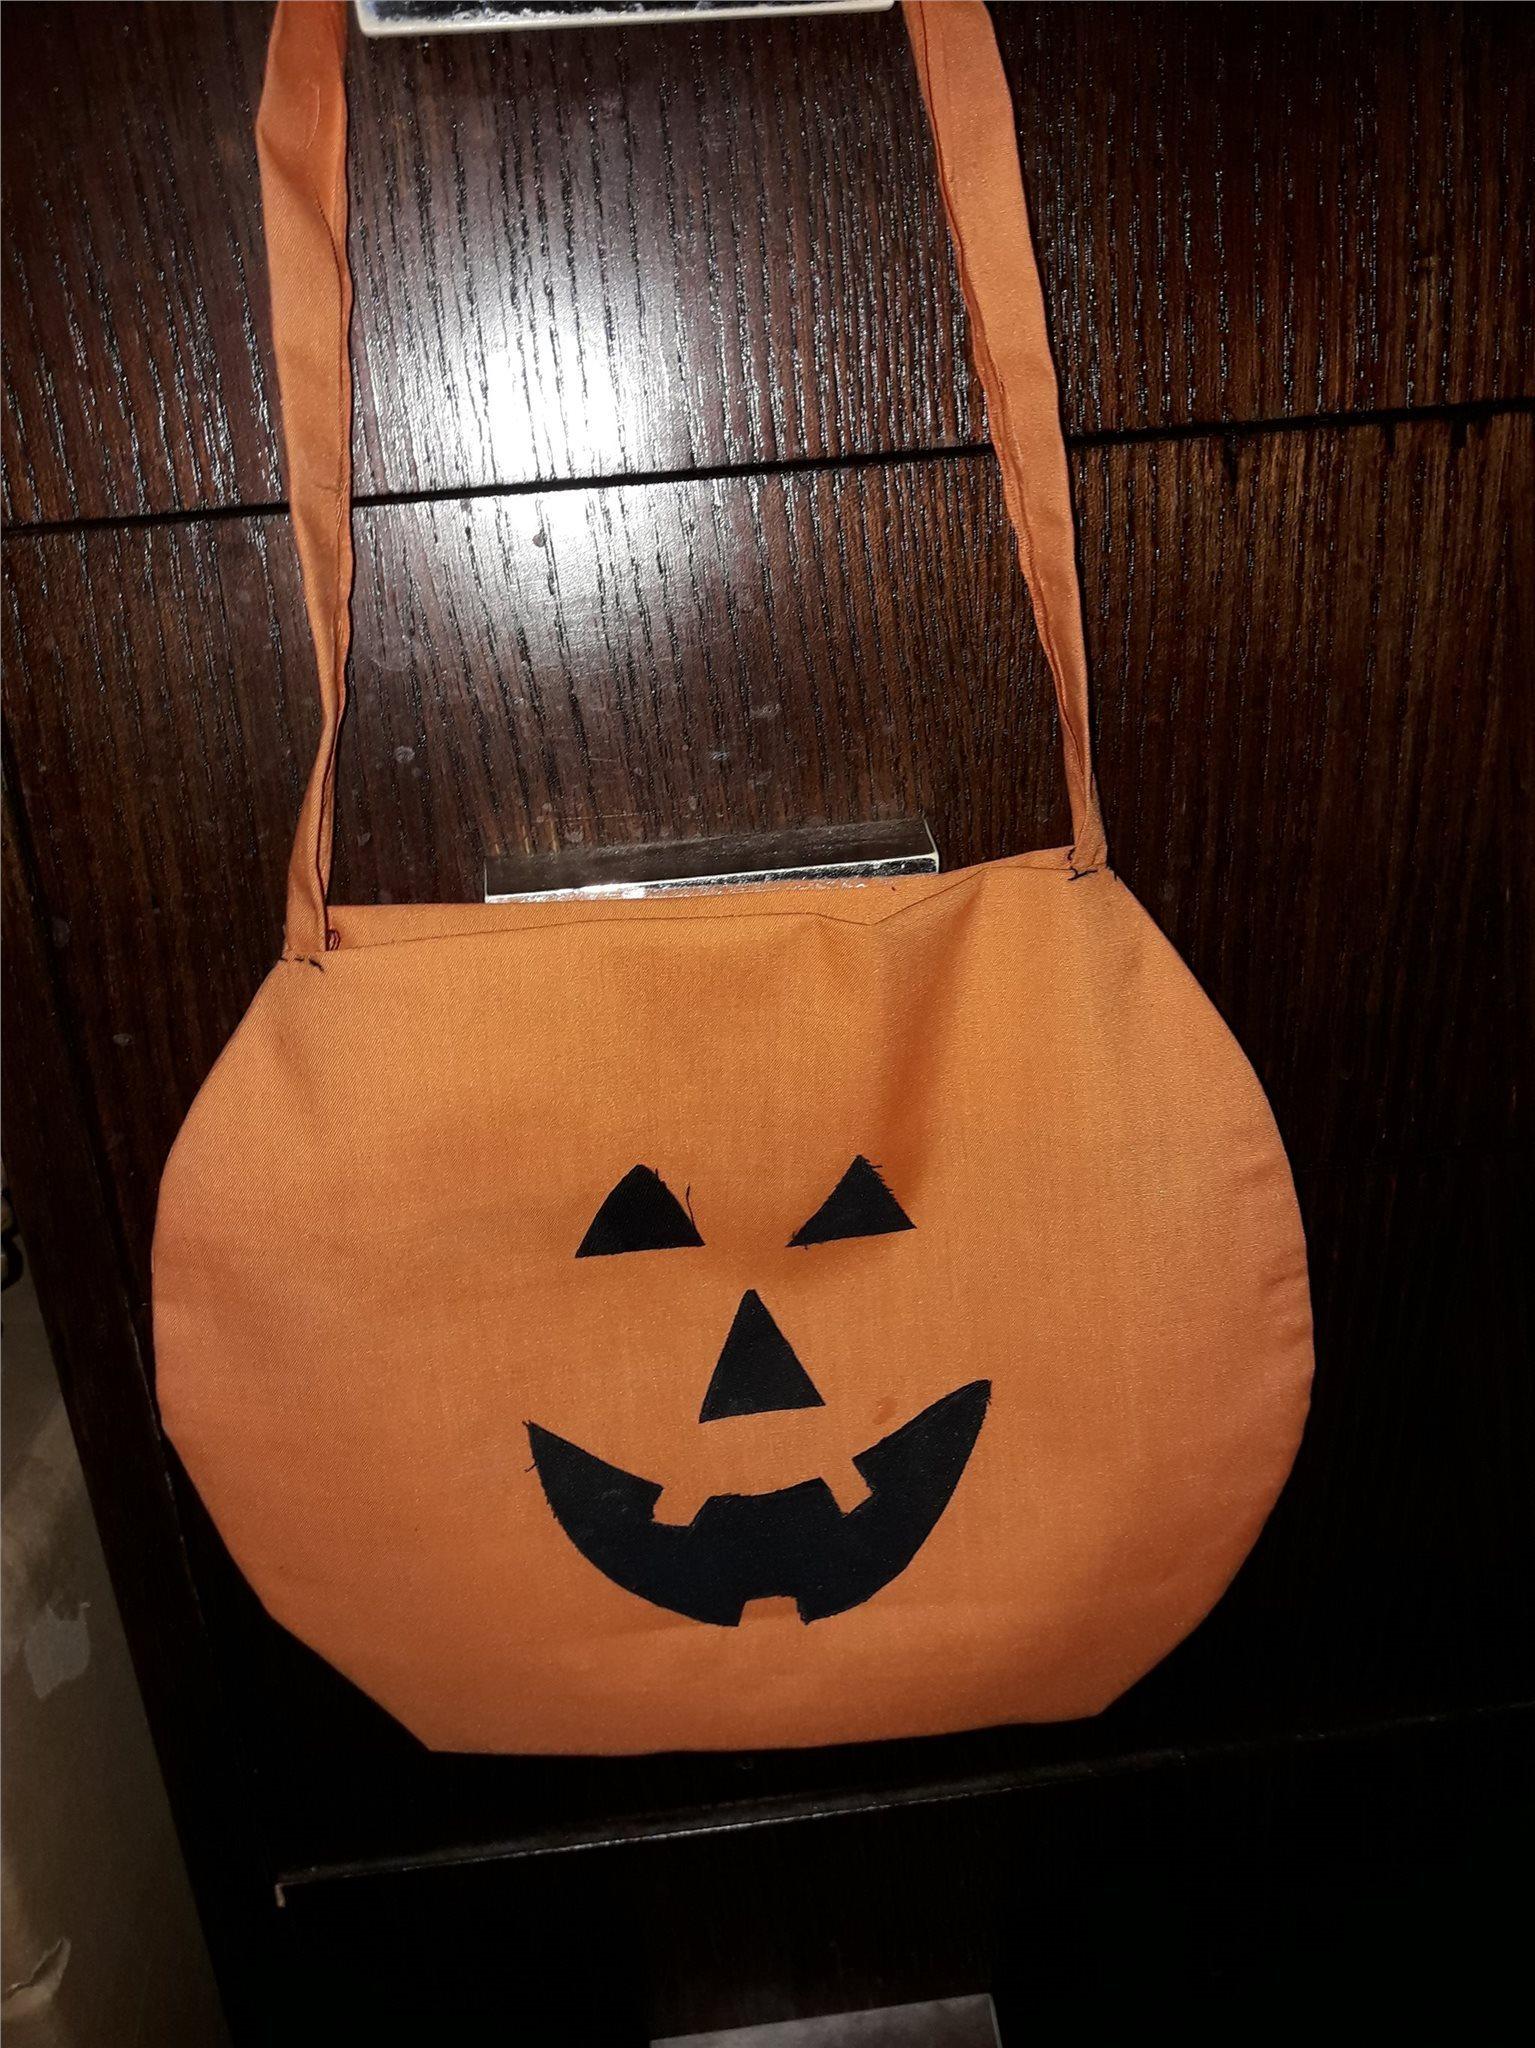 köpa halloween saker